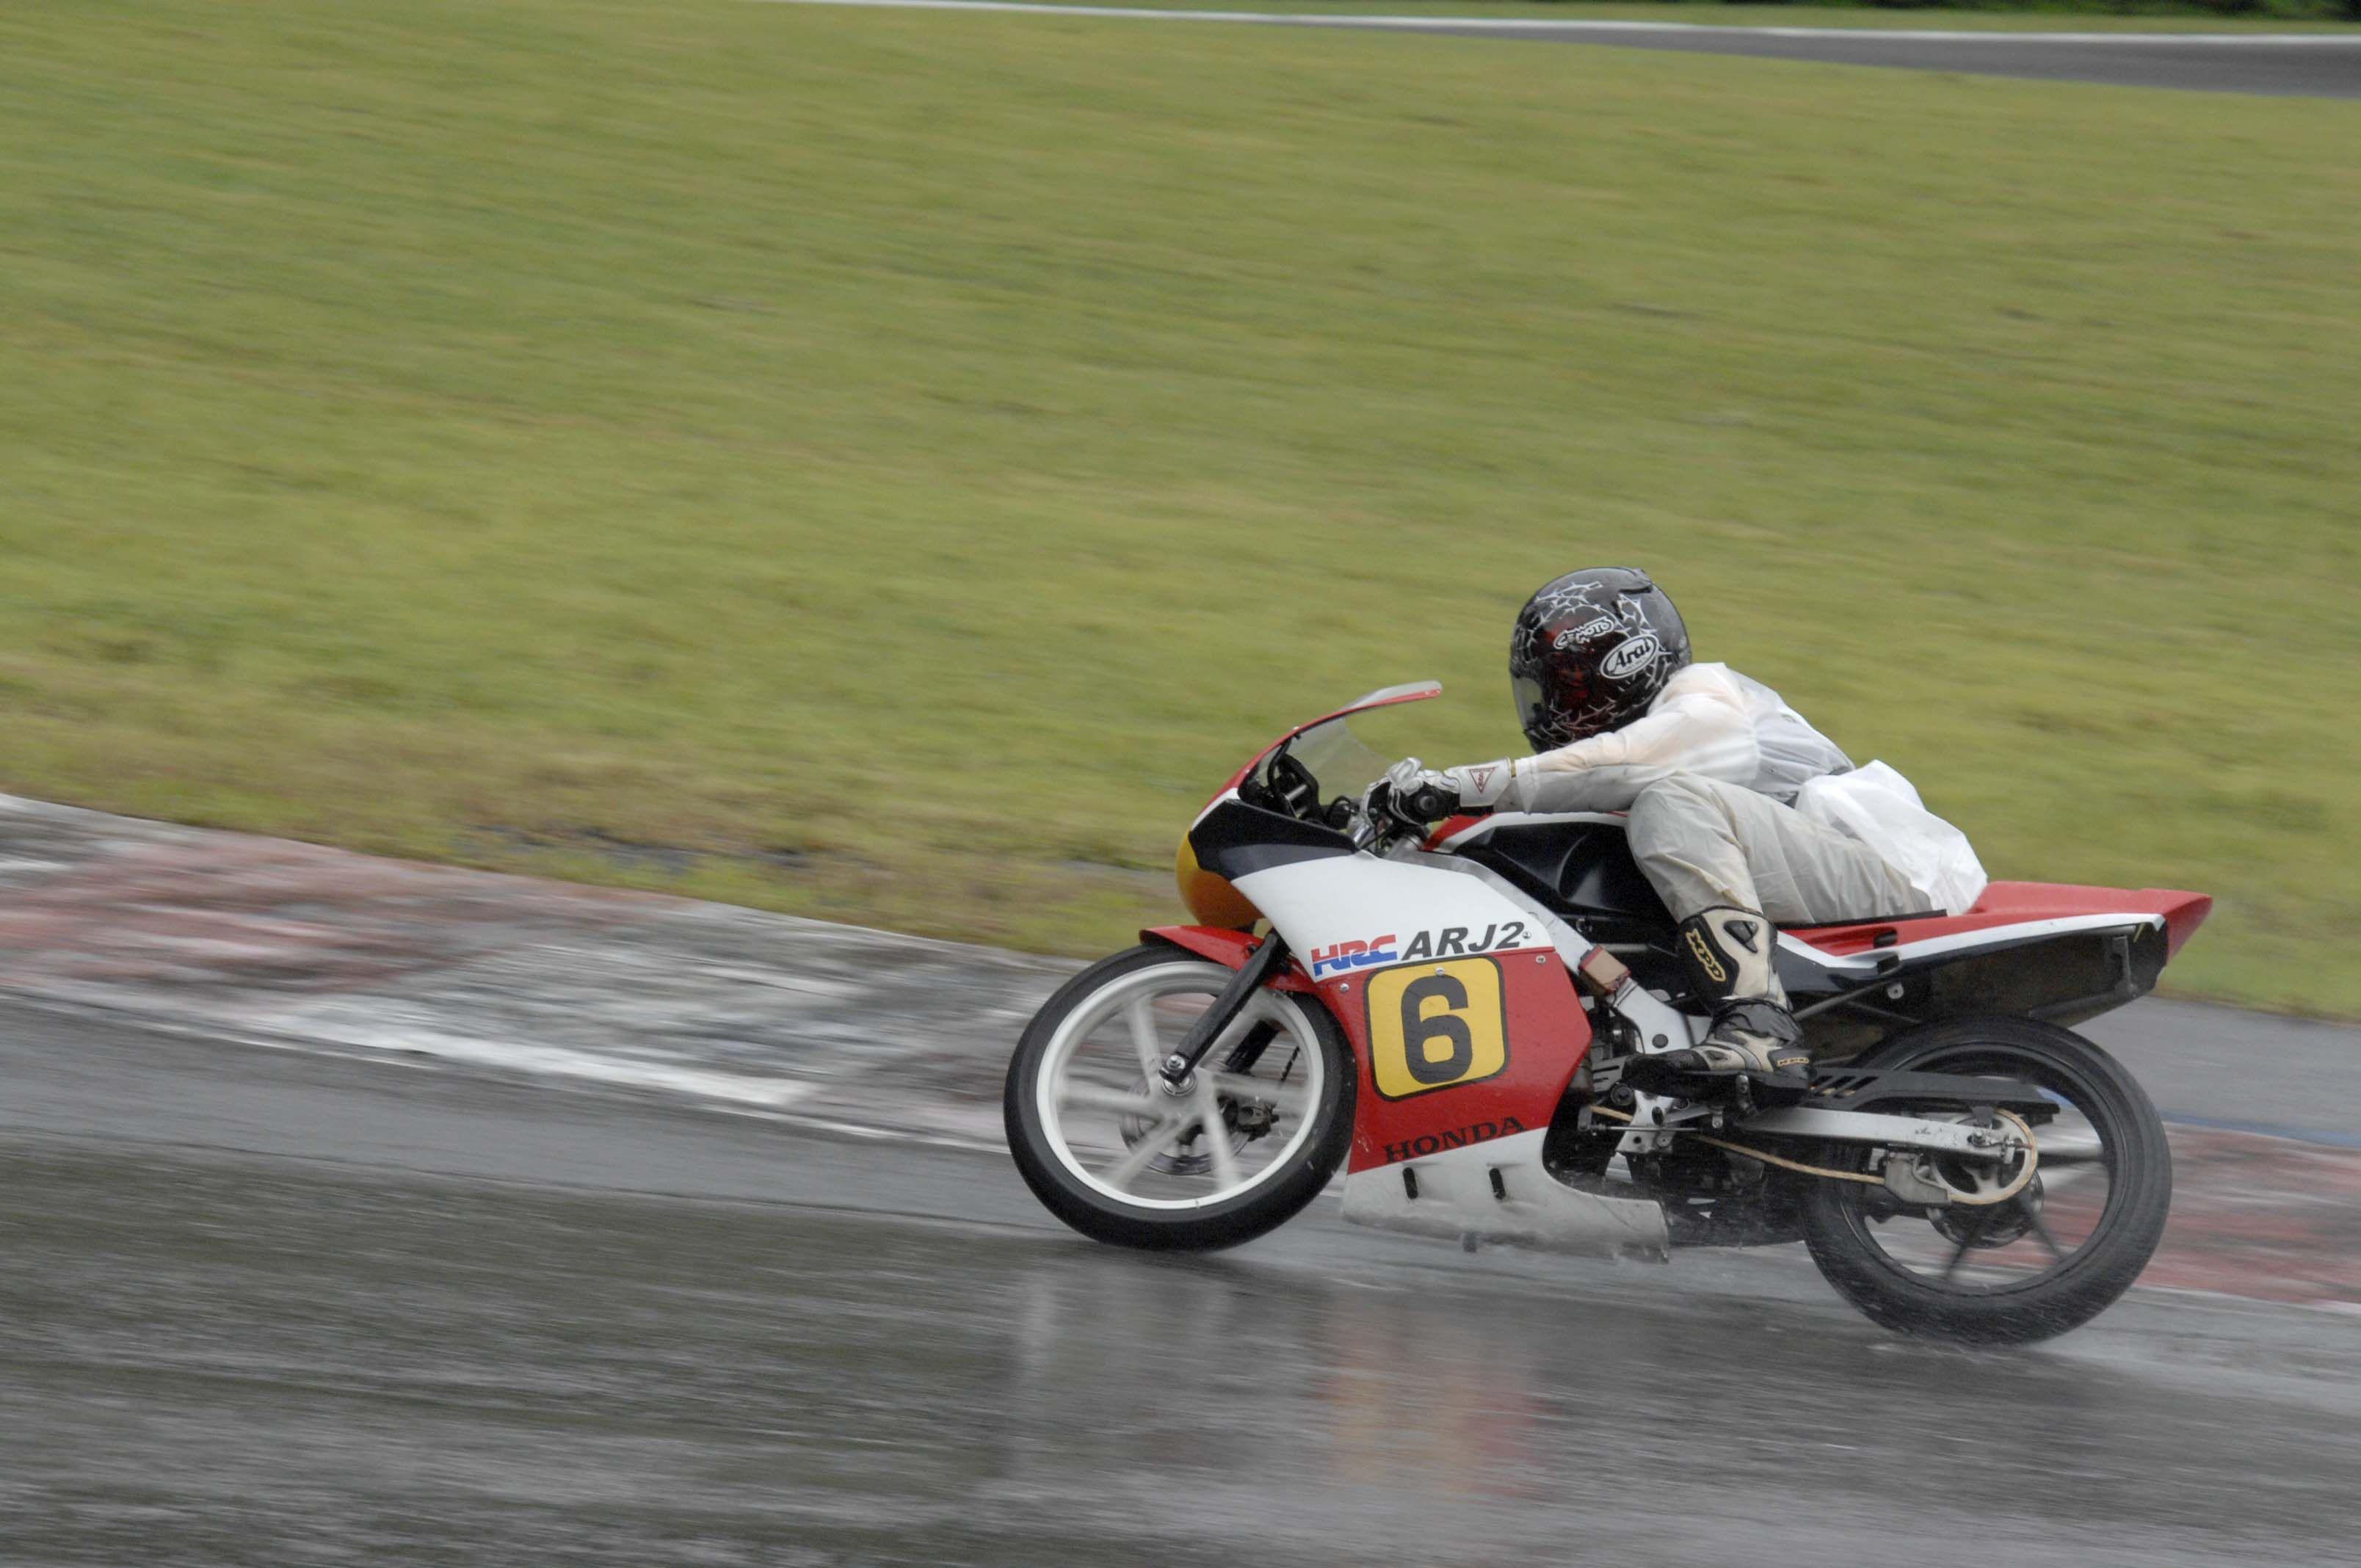 matelica7.com/... #ミニバイク #サーキット #レース #ヒーローしのいサーキット #80's #cafe racer #max10group #カフェレーサー #バイク女子 #cub race